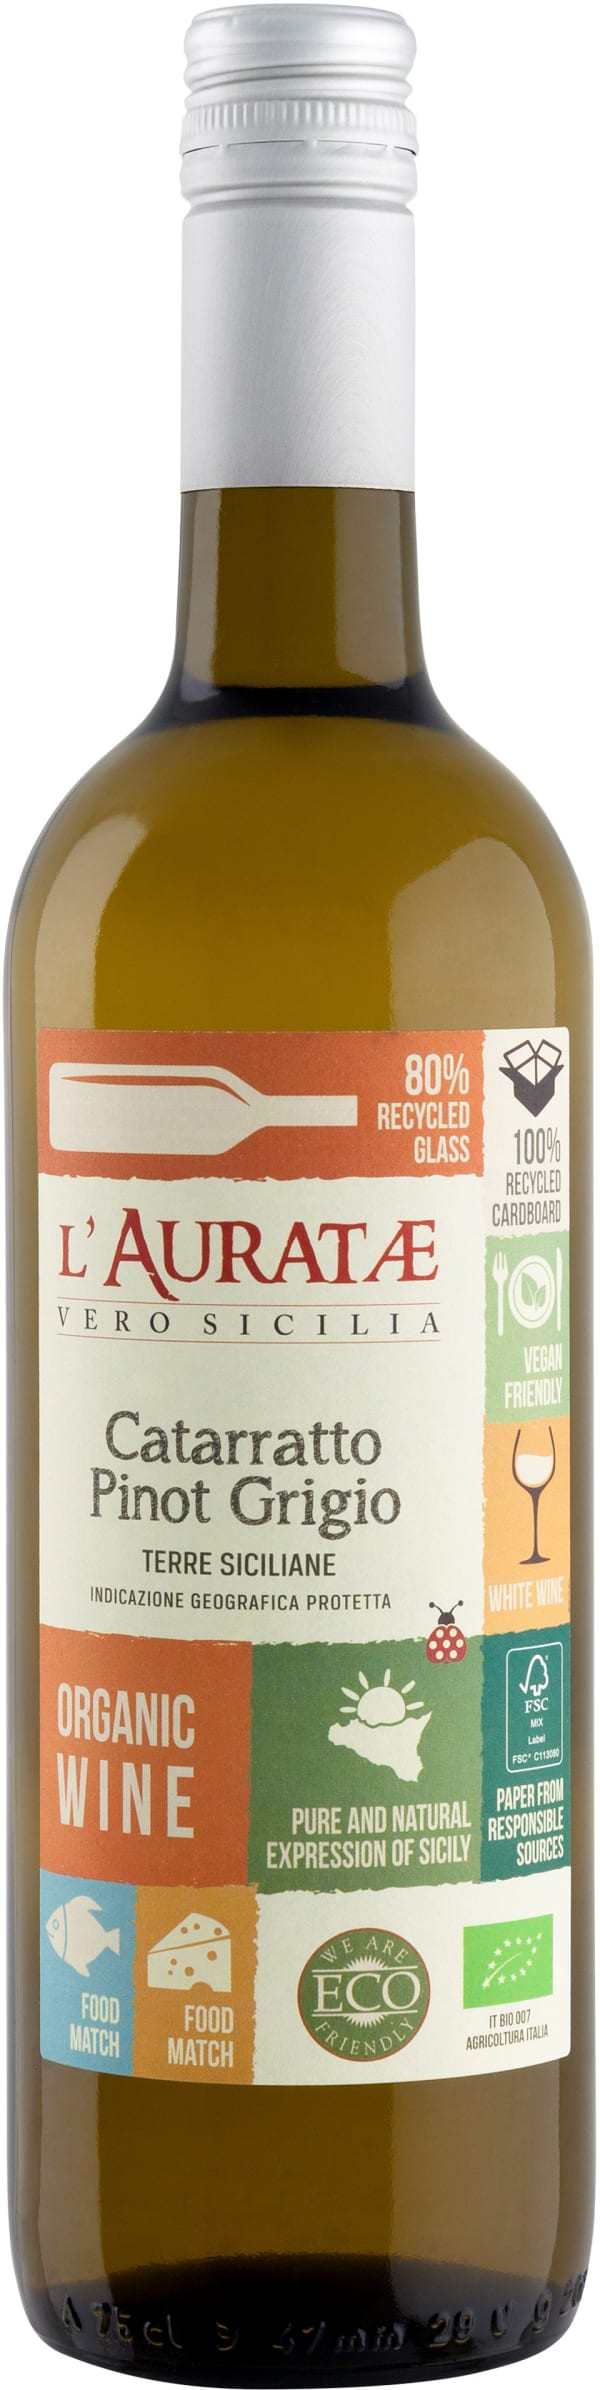 L'Auratae Organic Catarratto Pinot Grigio 2018